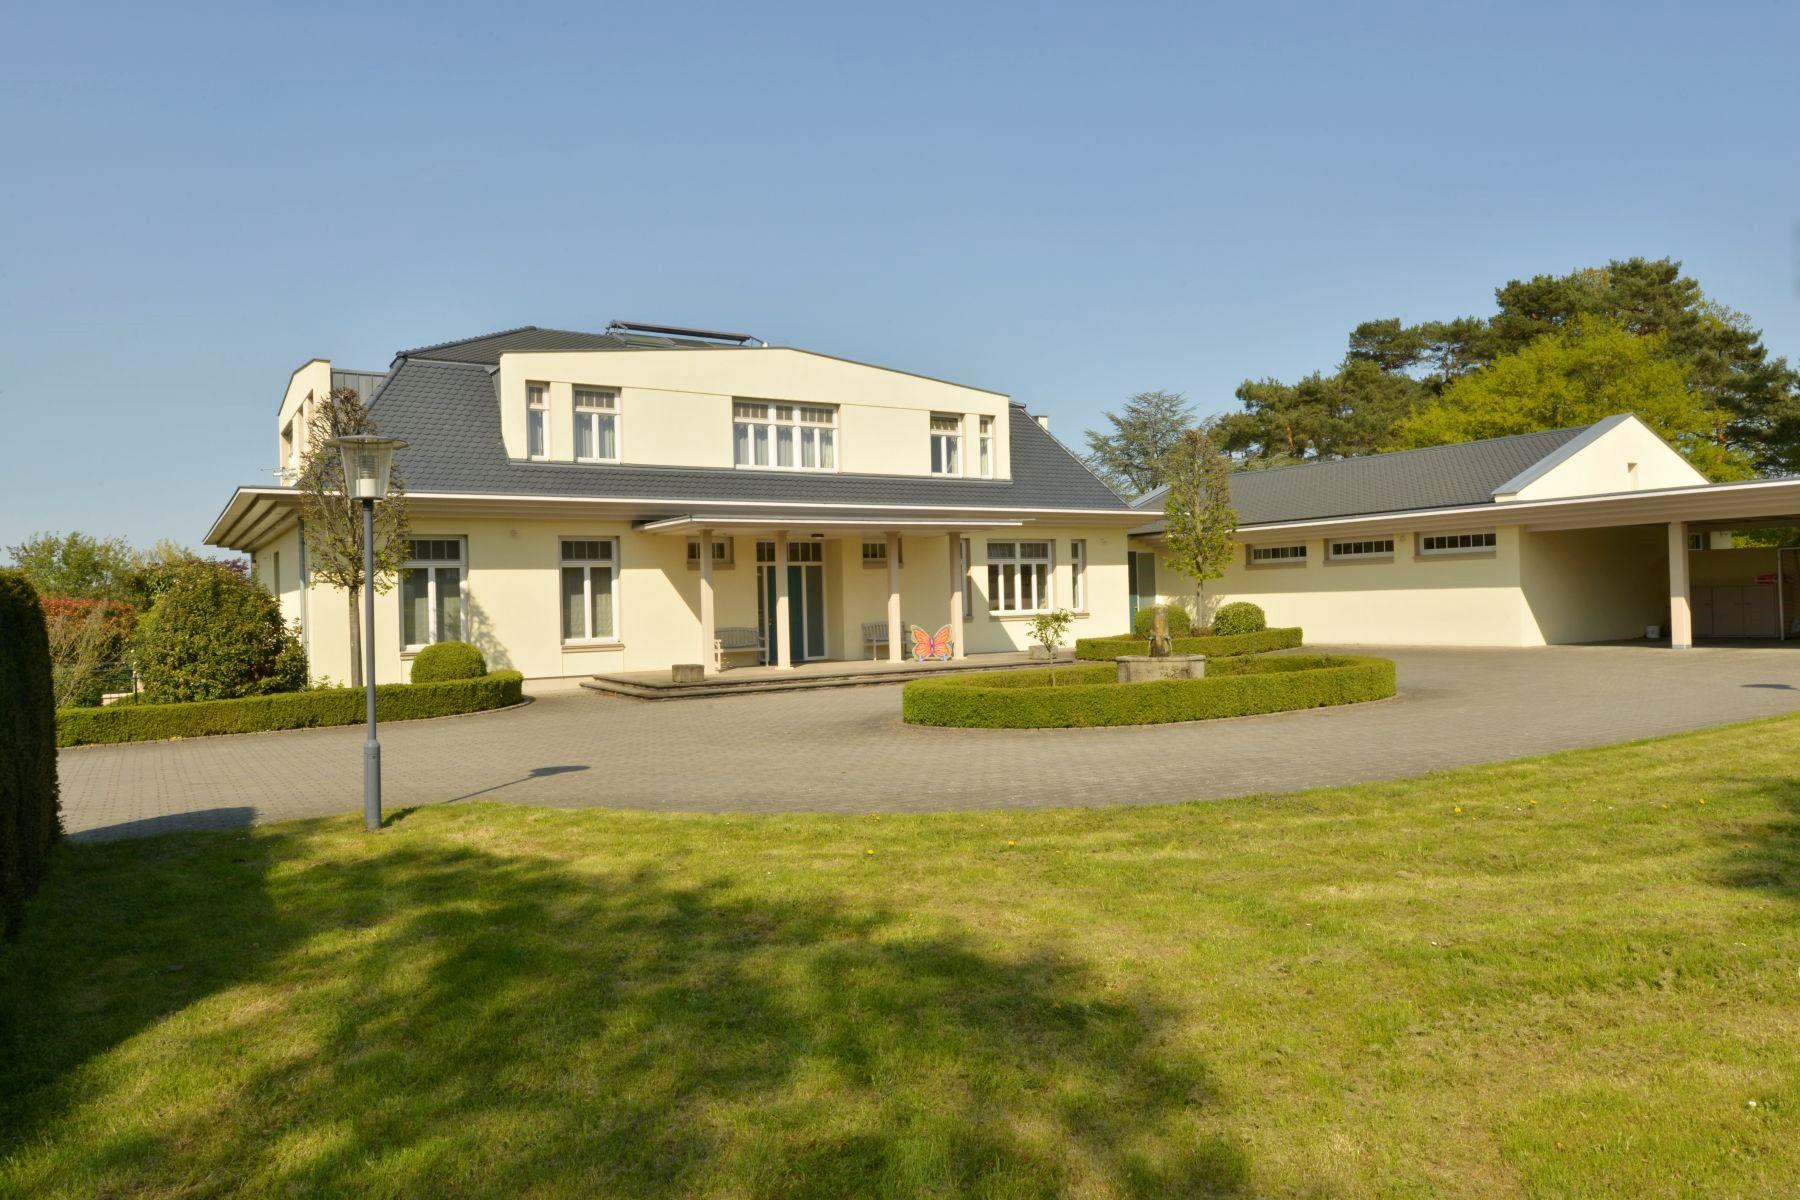 Additional photo for property listing at Stud Wachtberg Wachtberg, North Rhine Westphalia Germany